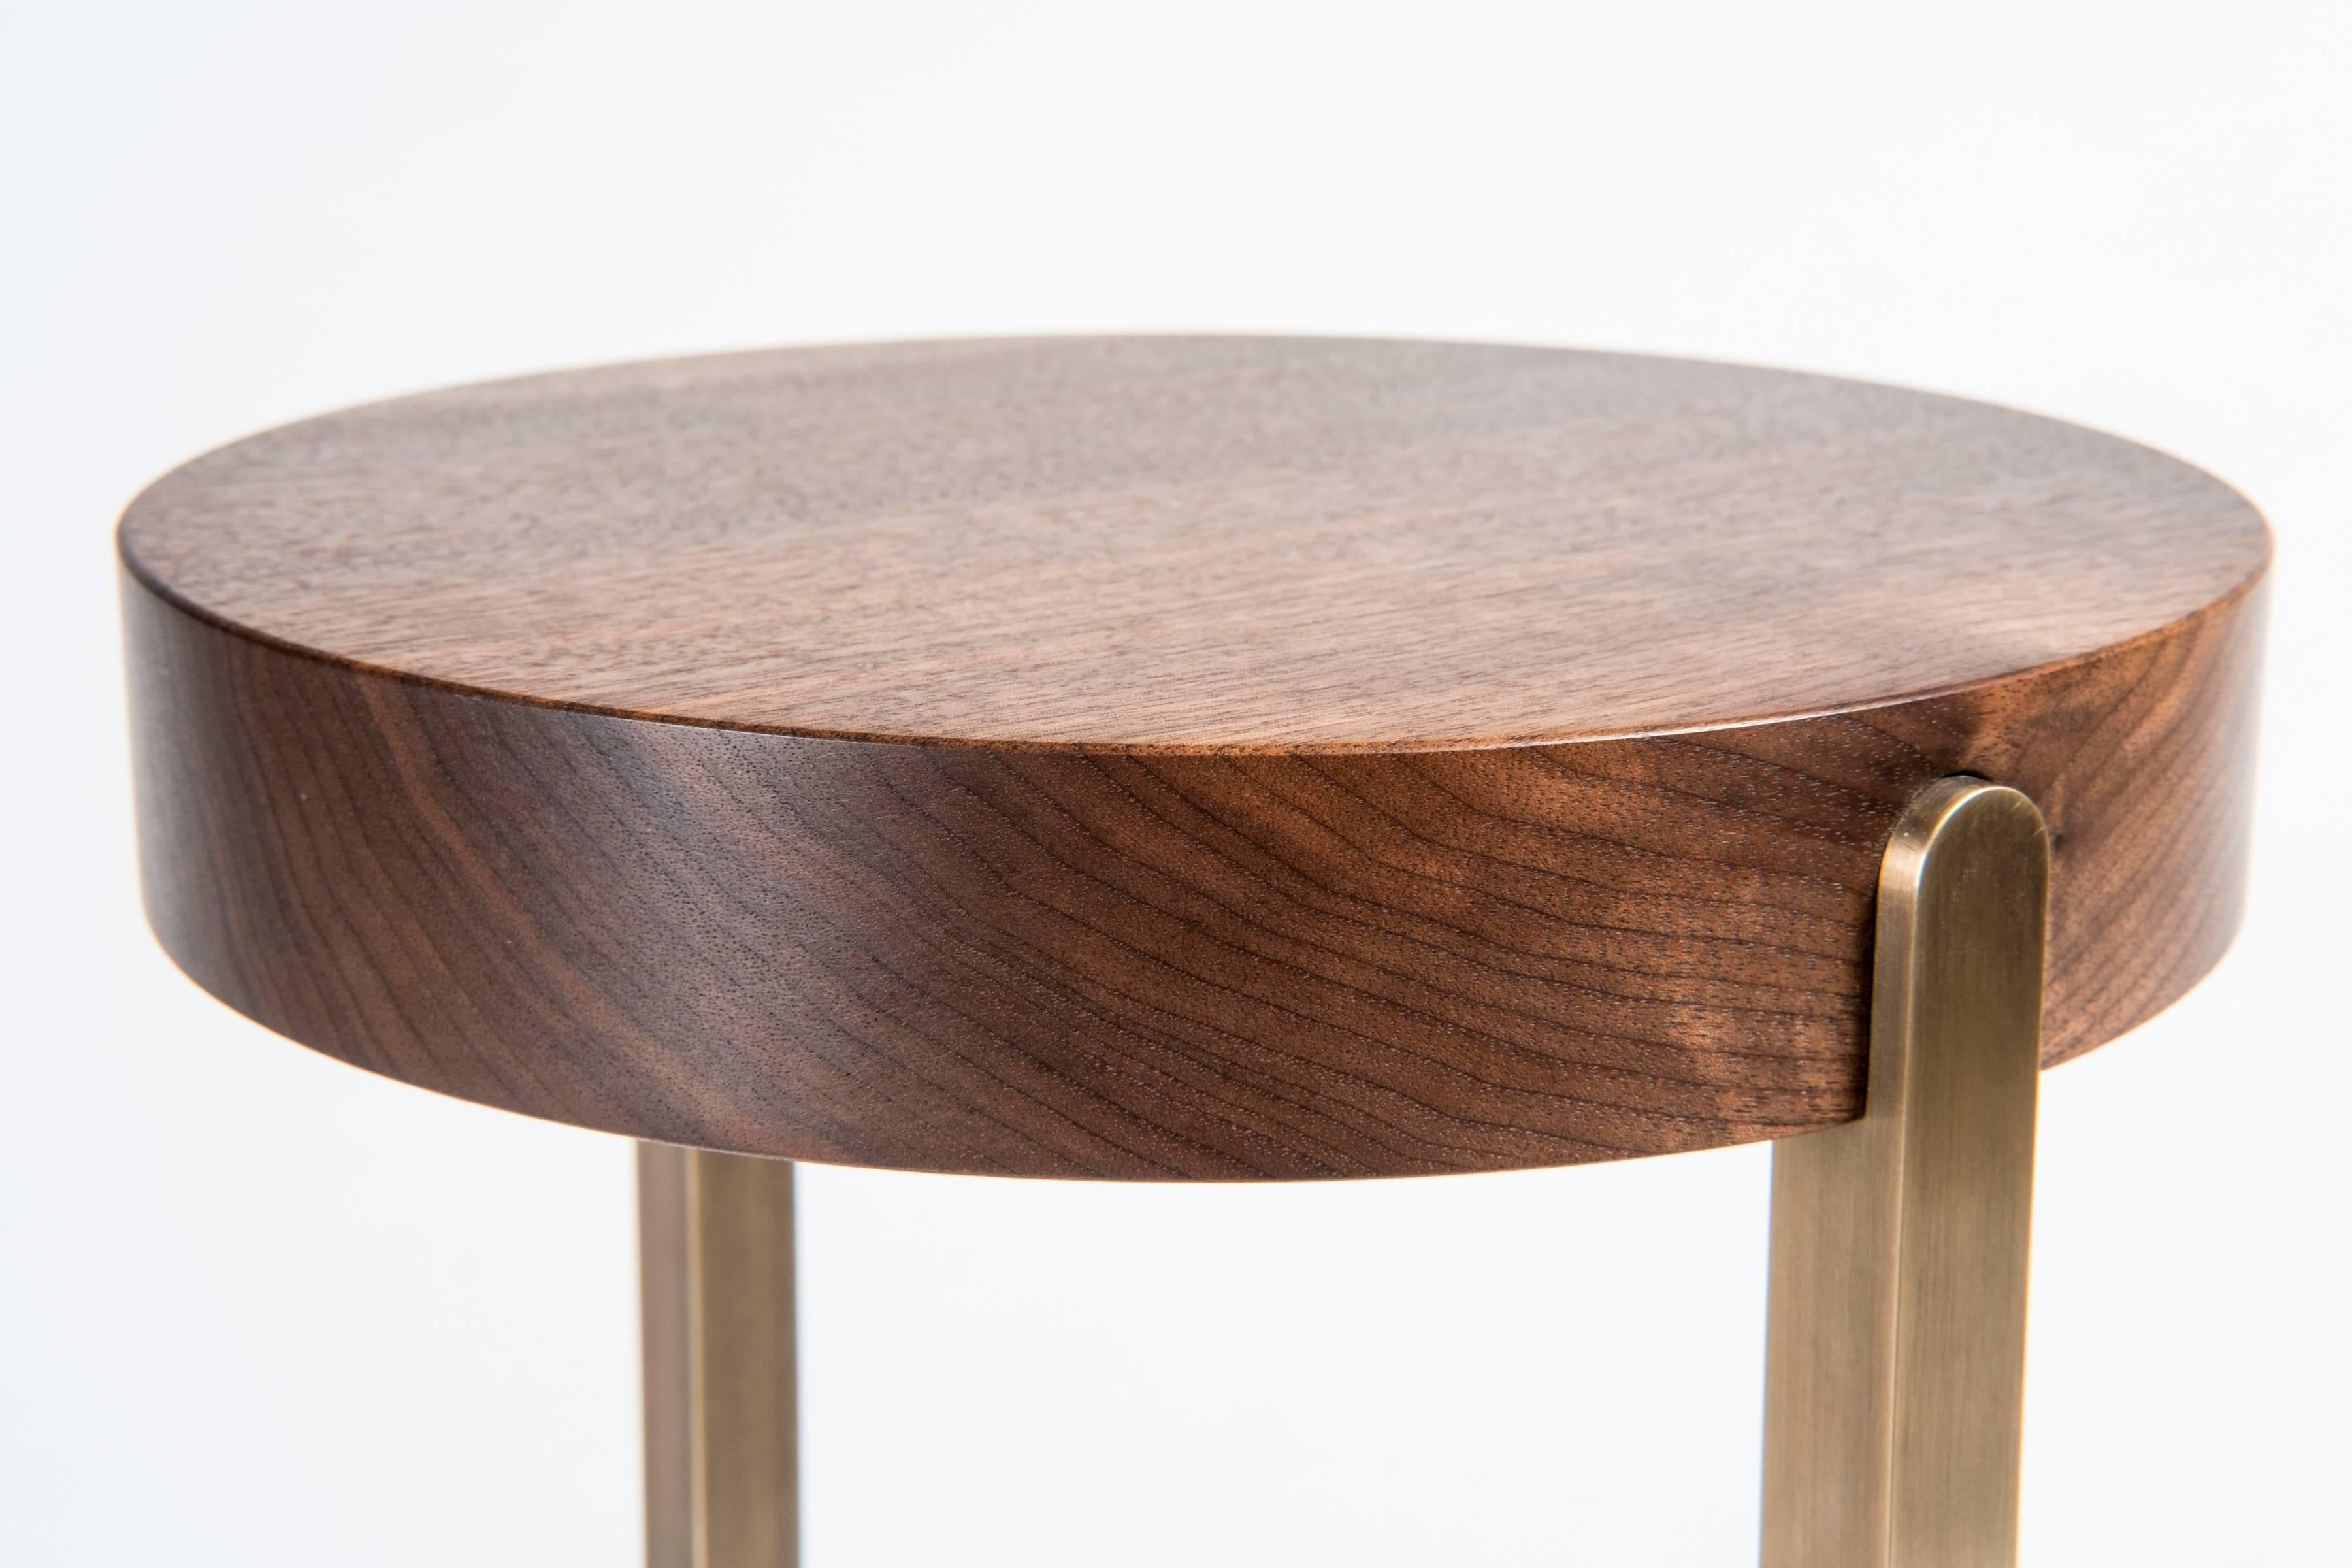 Modern Union Mini Side Table Stand By Tretiak Works, Contemporary Walnut  Brass For Sale